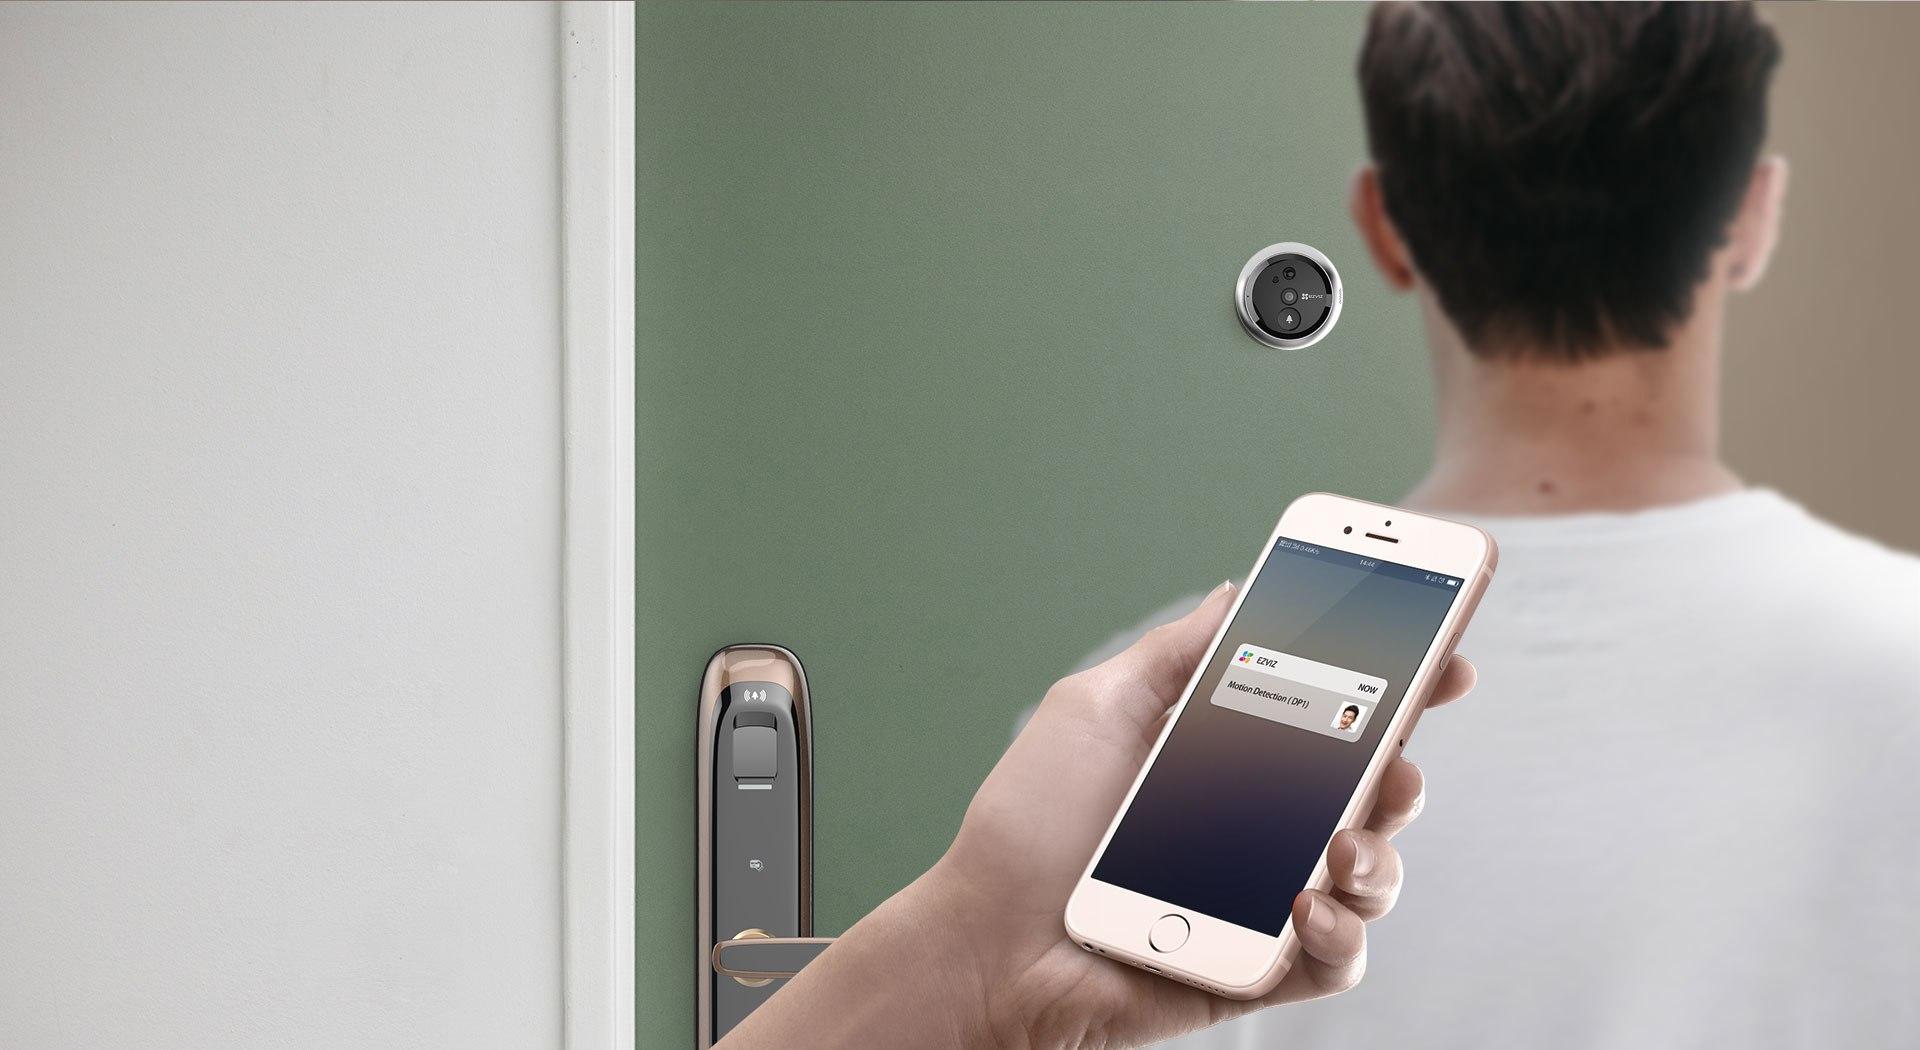 ezviz dp1  DP1 - EZVIZ Smart Home Device